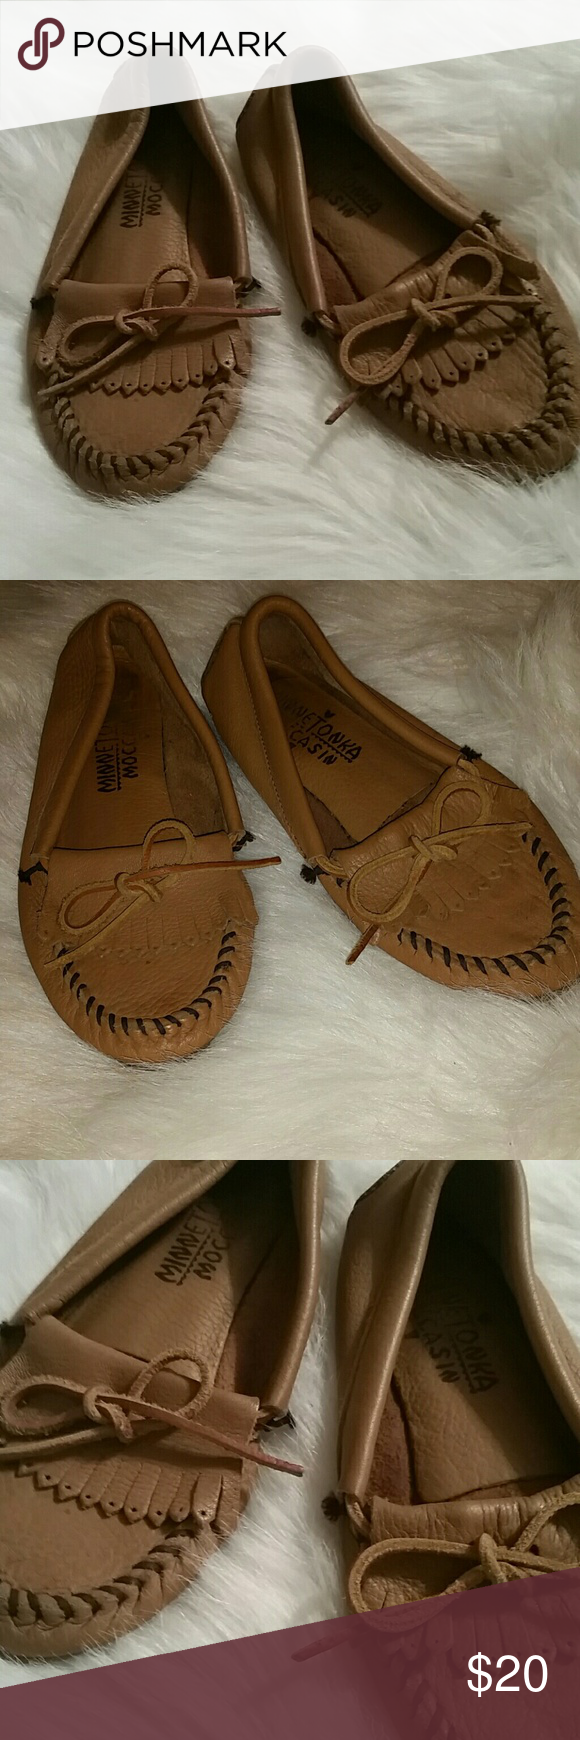 Minnetonka moccasins size 7 Minnetonka moccasins size 7 Minnetonka Shoes Moccasins